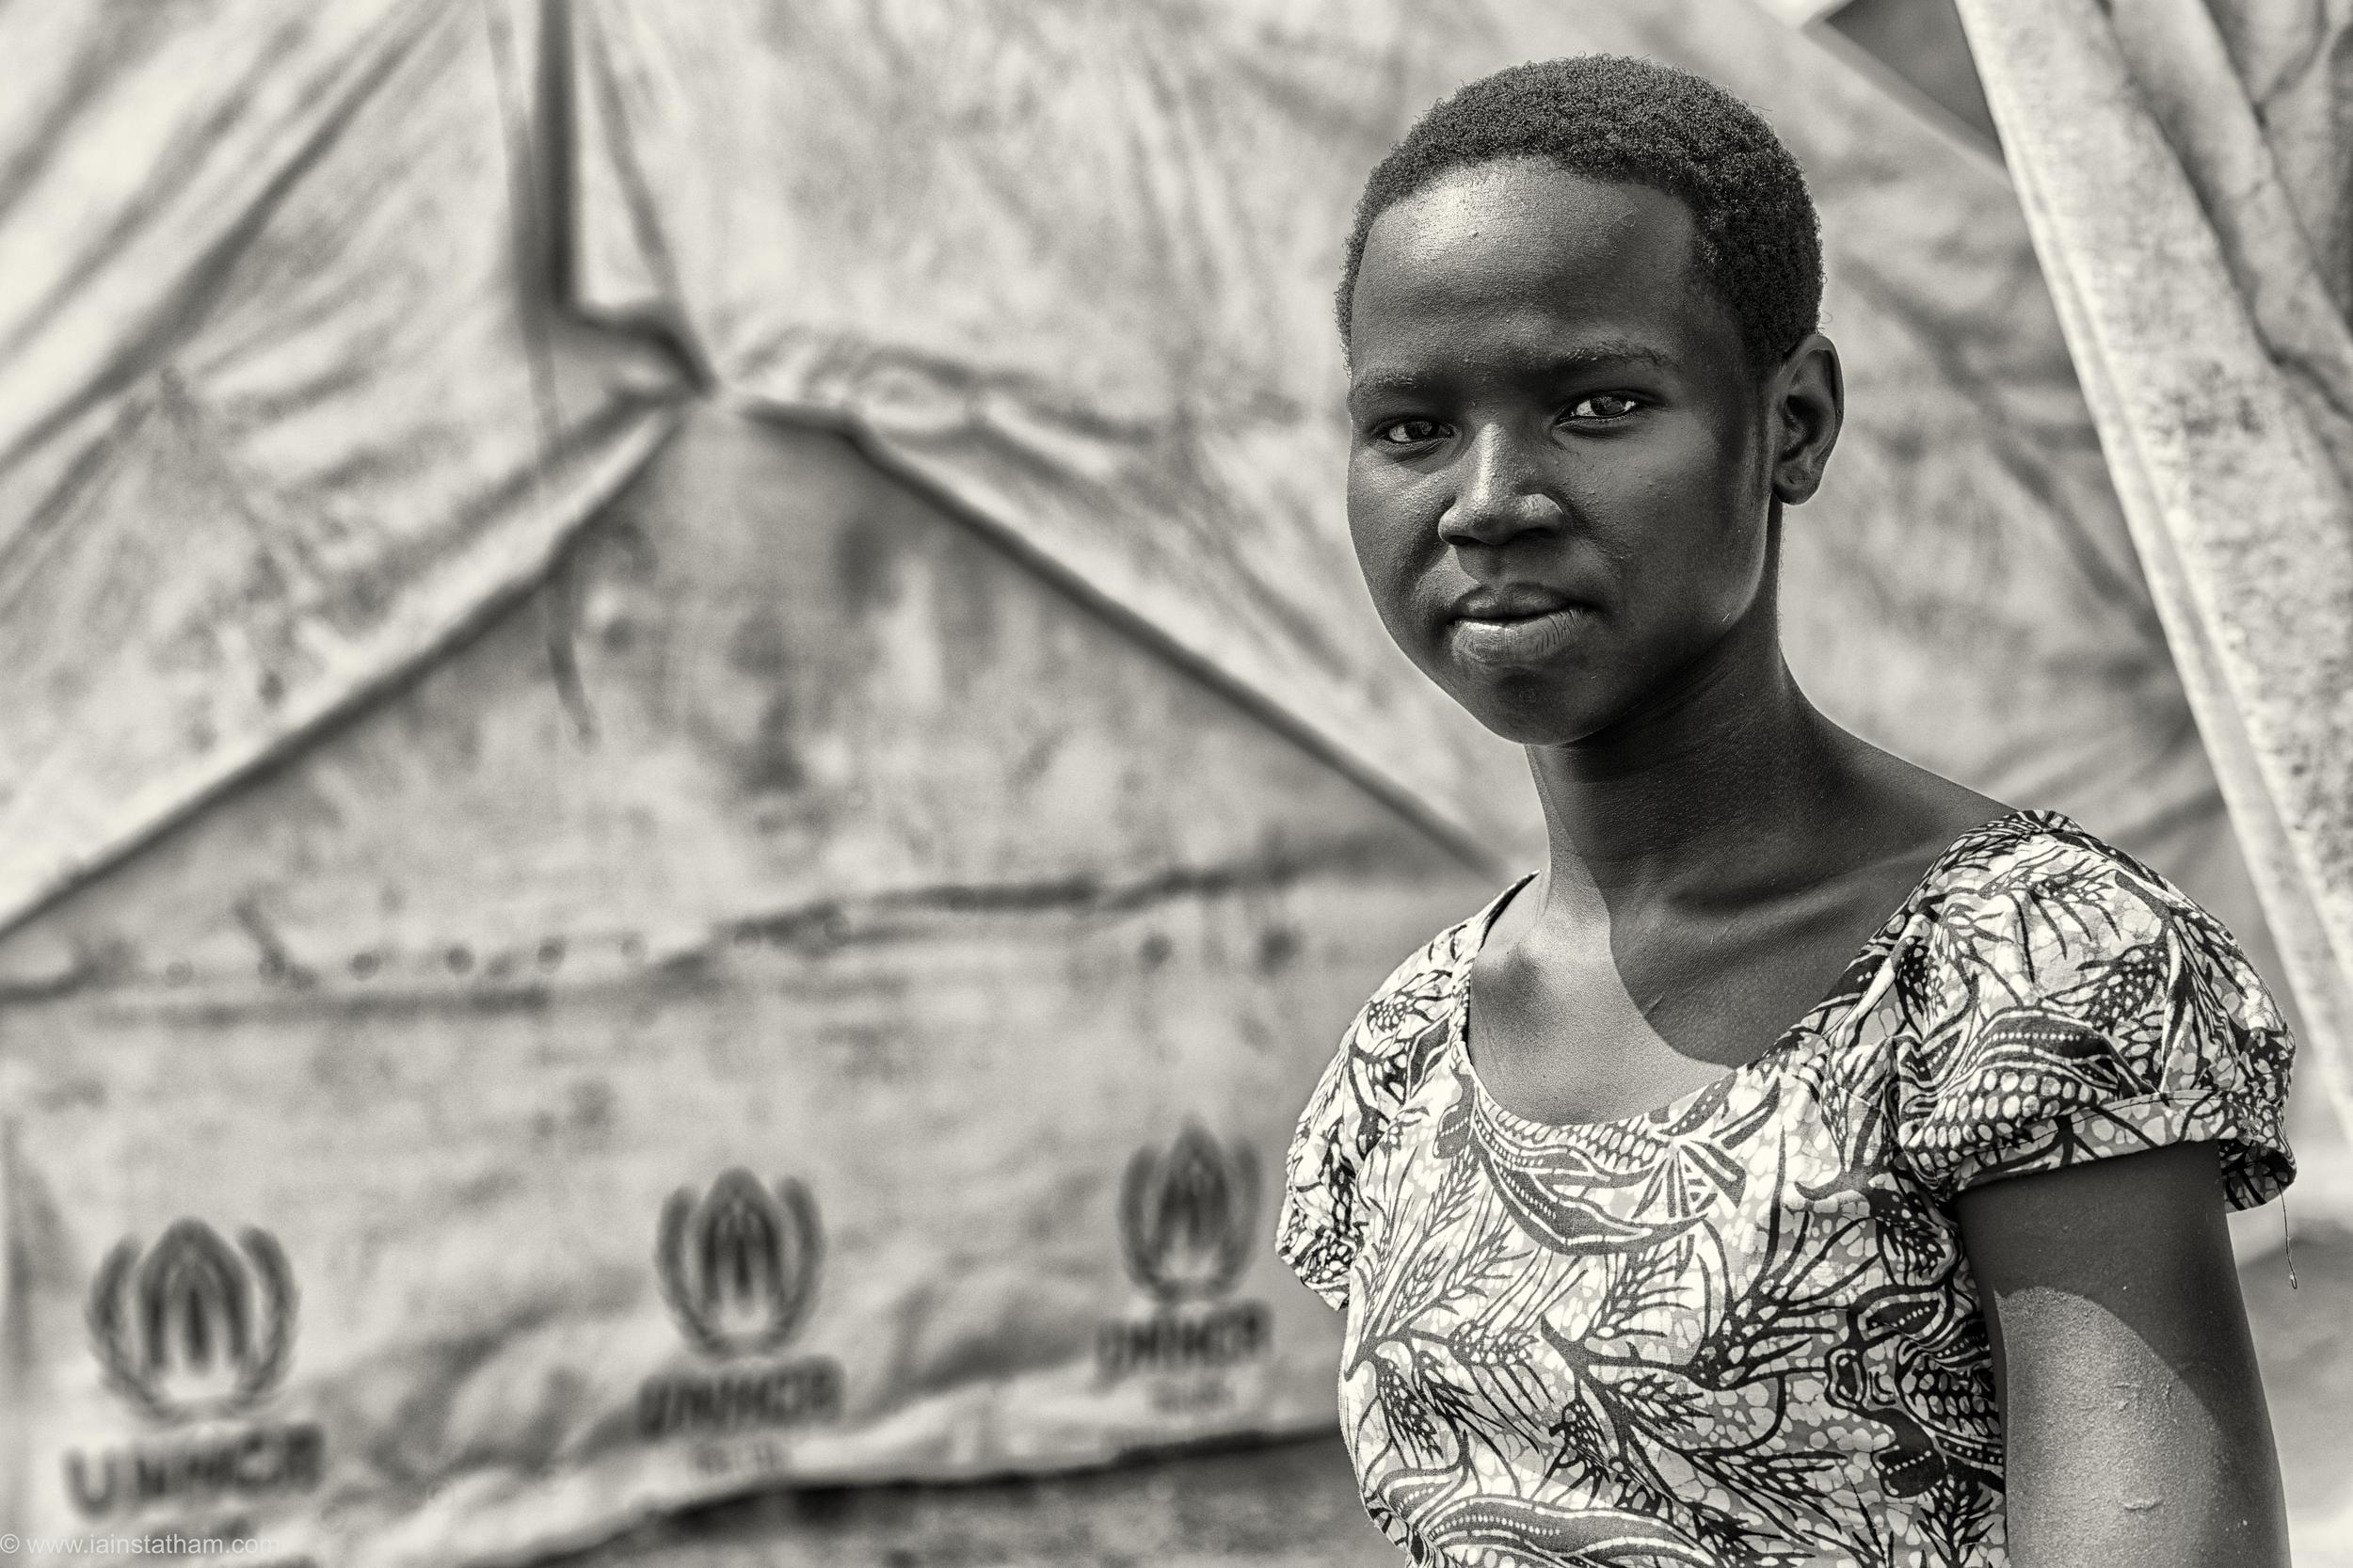 ug - south sudan refugees - dziapi - bw-28.jpg